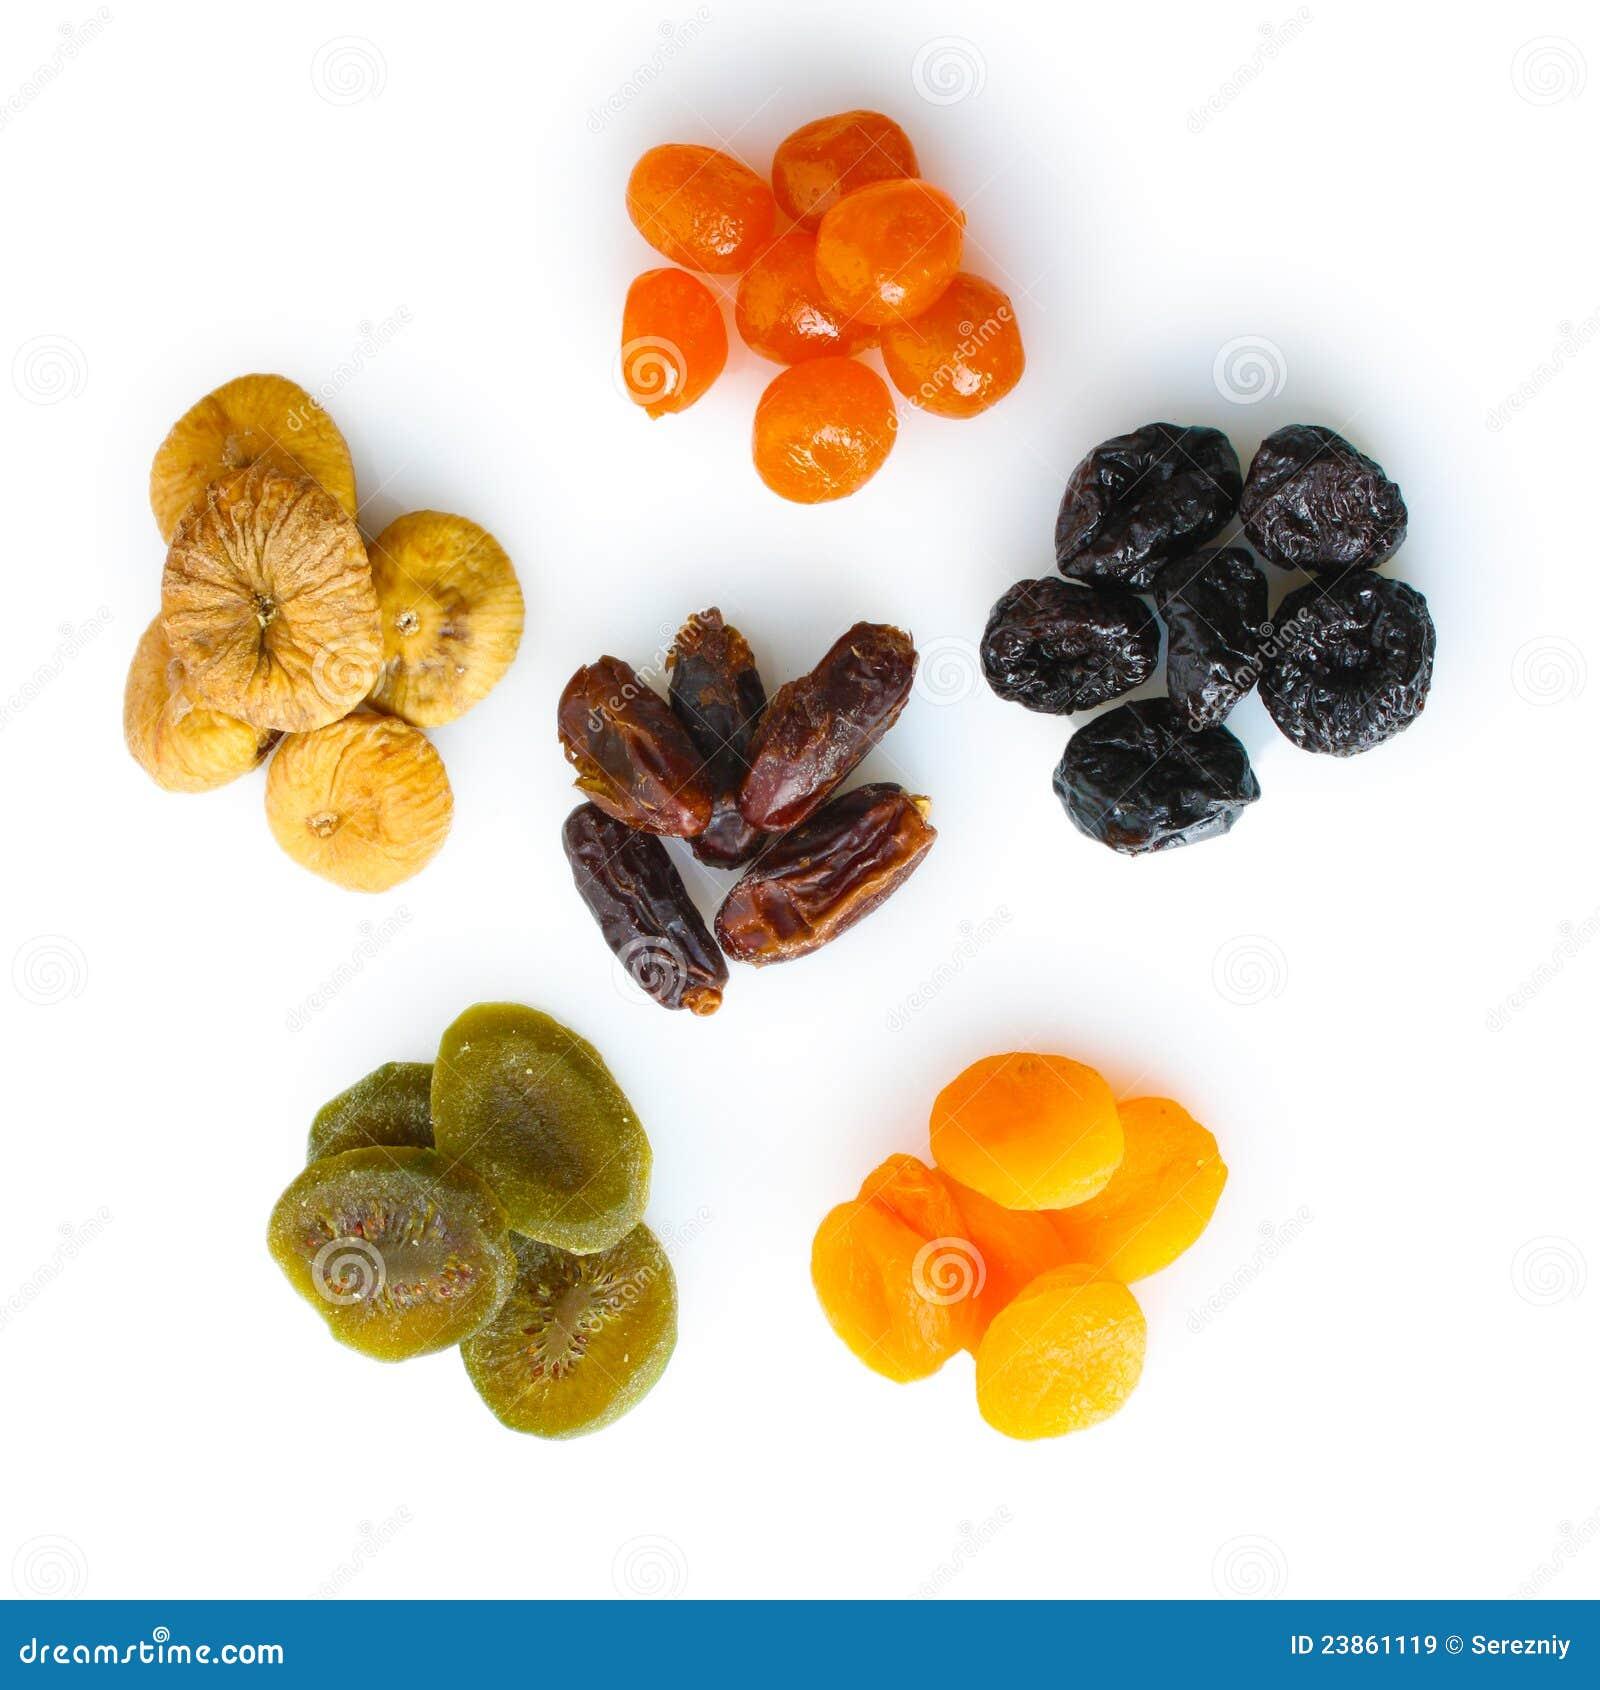 Fruits Vegetables Export | Profitable Business Idea